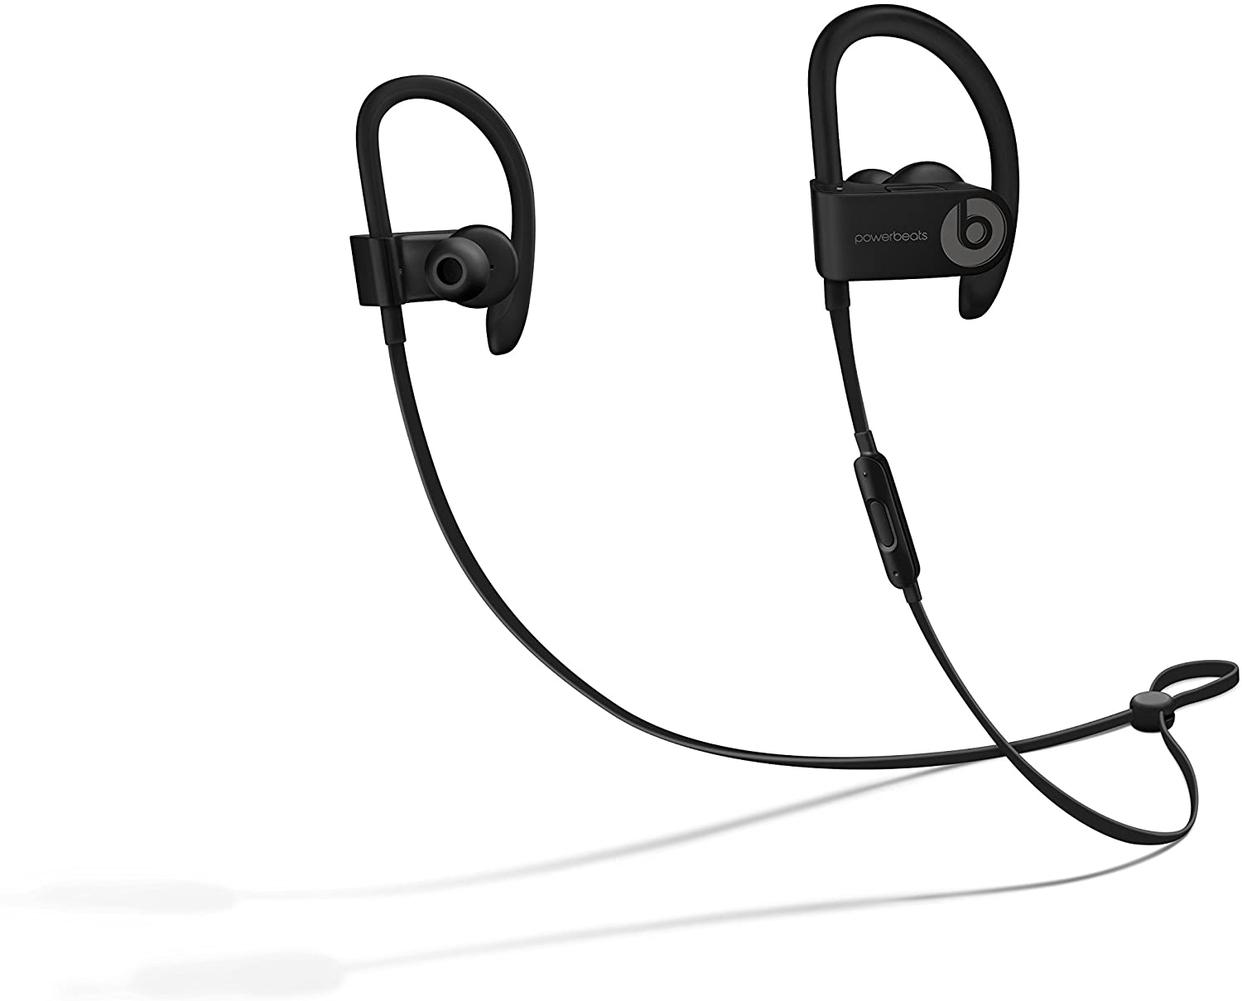 Beats by dr.dre(ビーツバイドクタードレー) Powerbeats3 Wireless ML8V2PA/Aの商品画像3